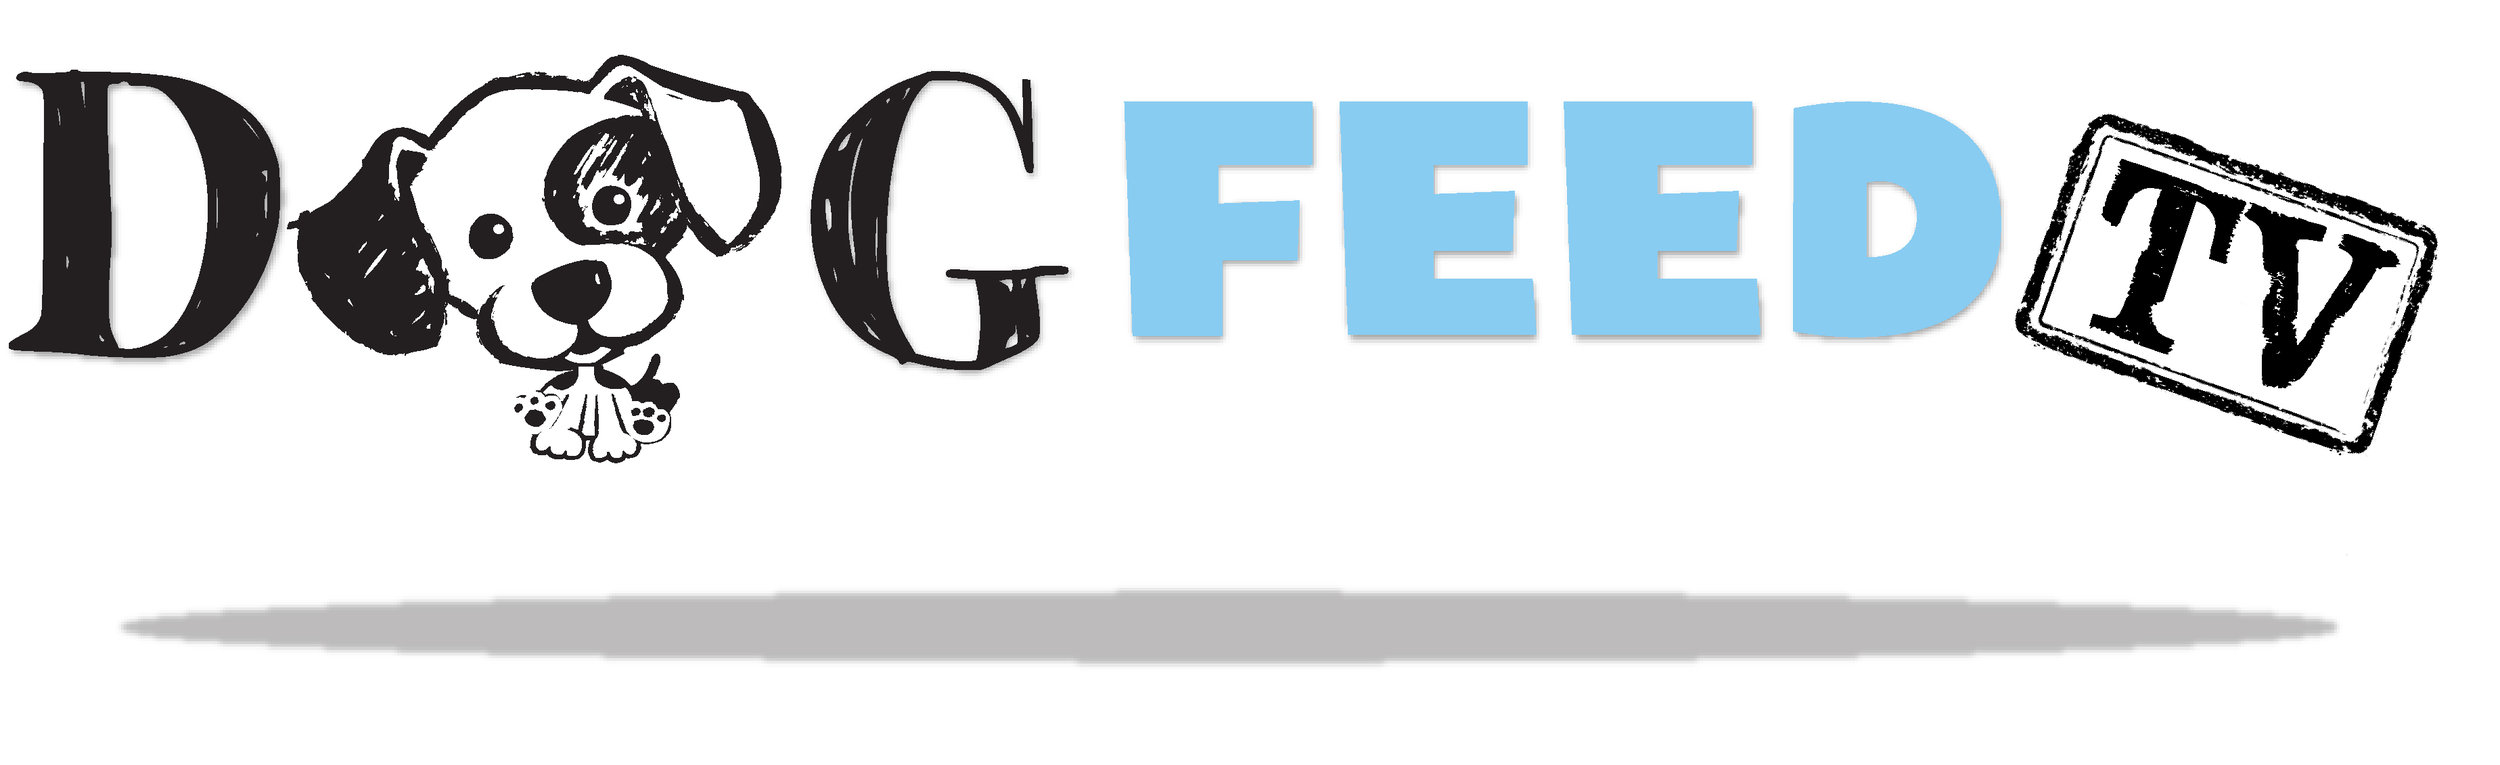 DogFeed TV banner.jpg